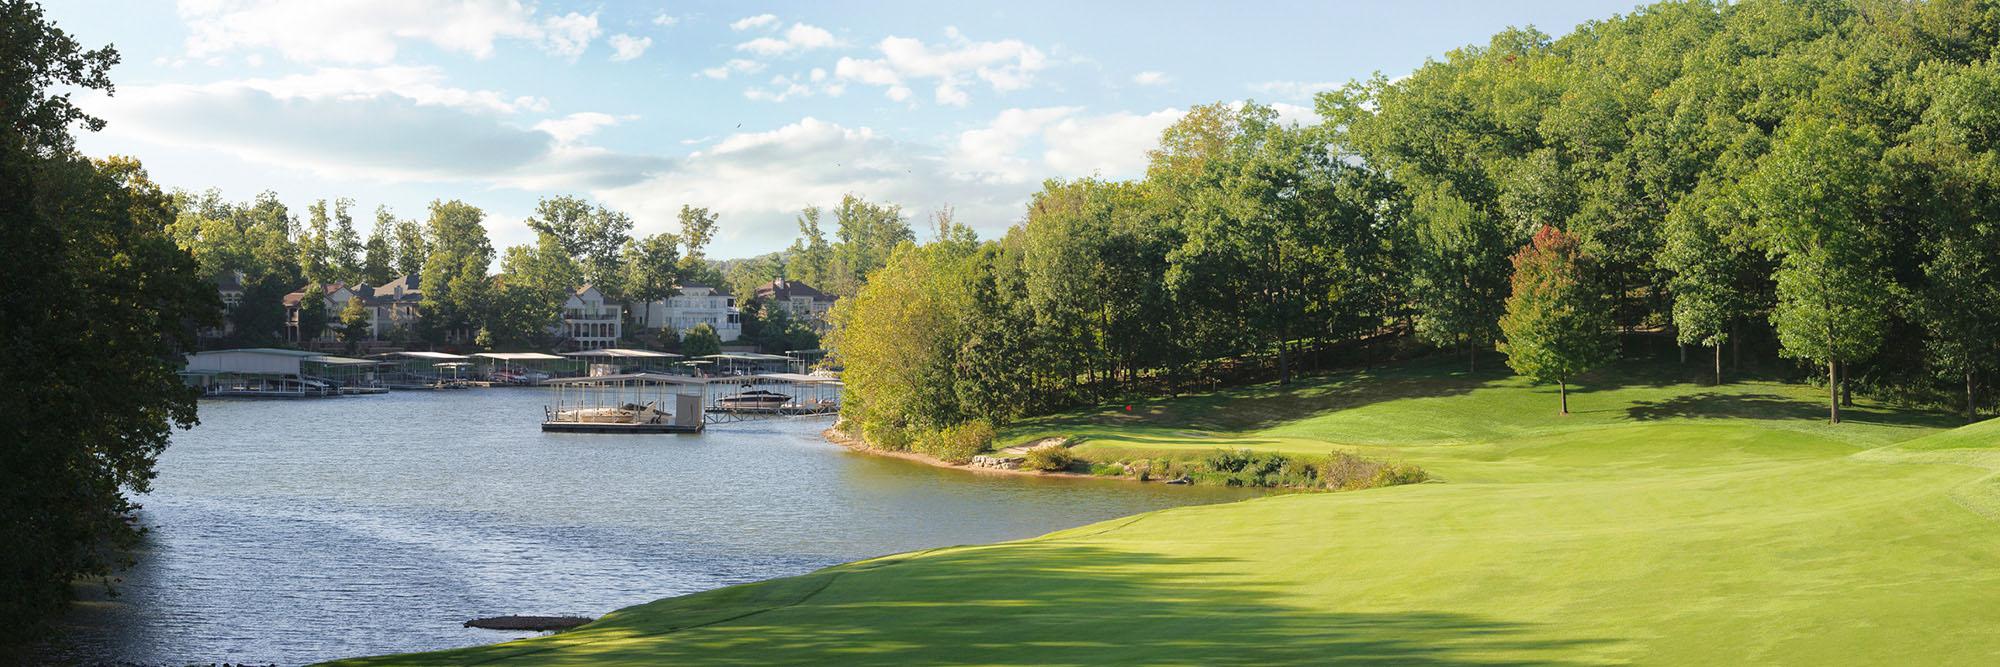 Golf Course Image - The Club at Porto Cima No. 13